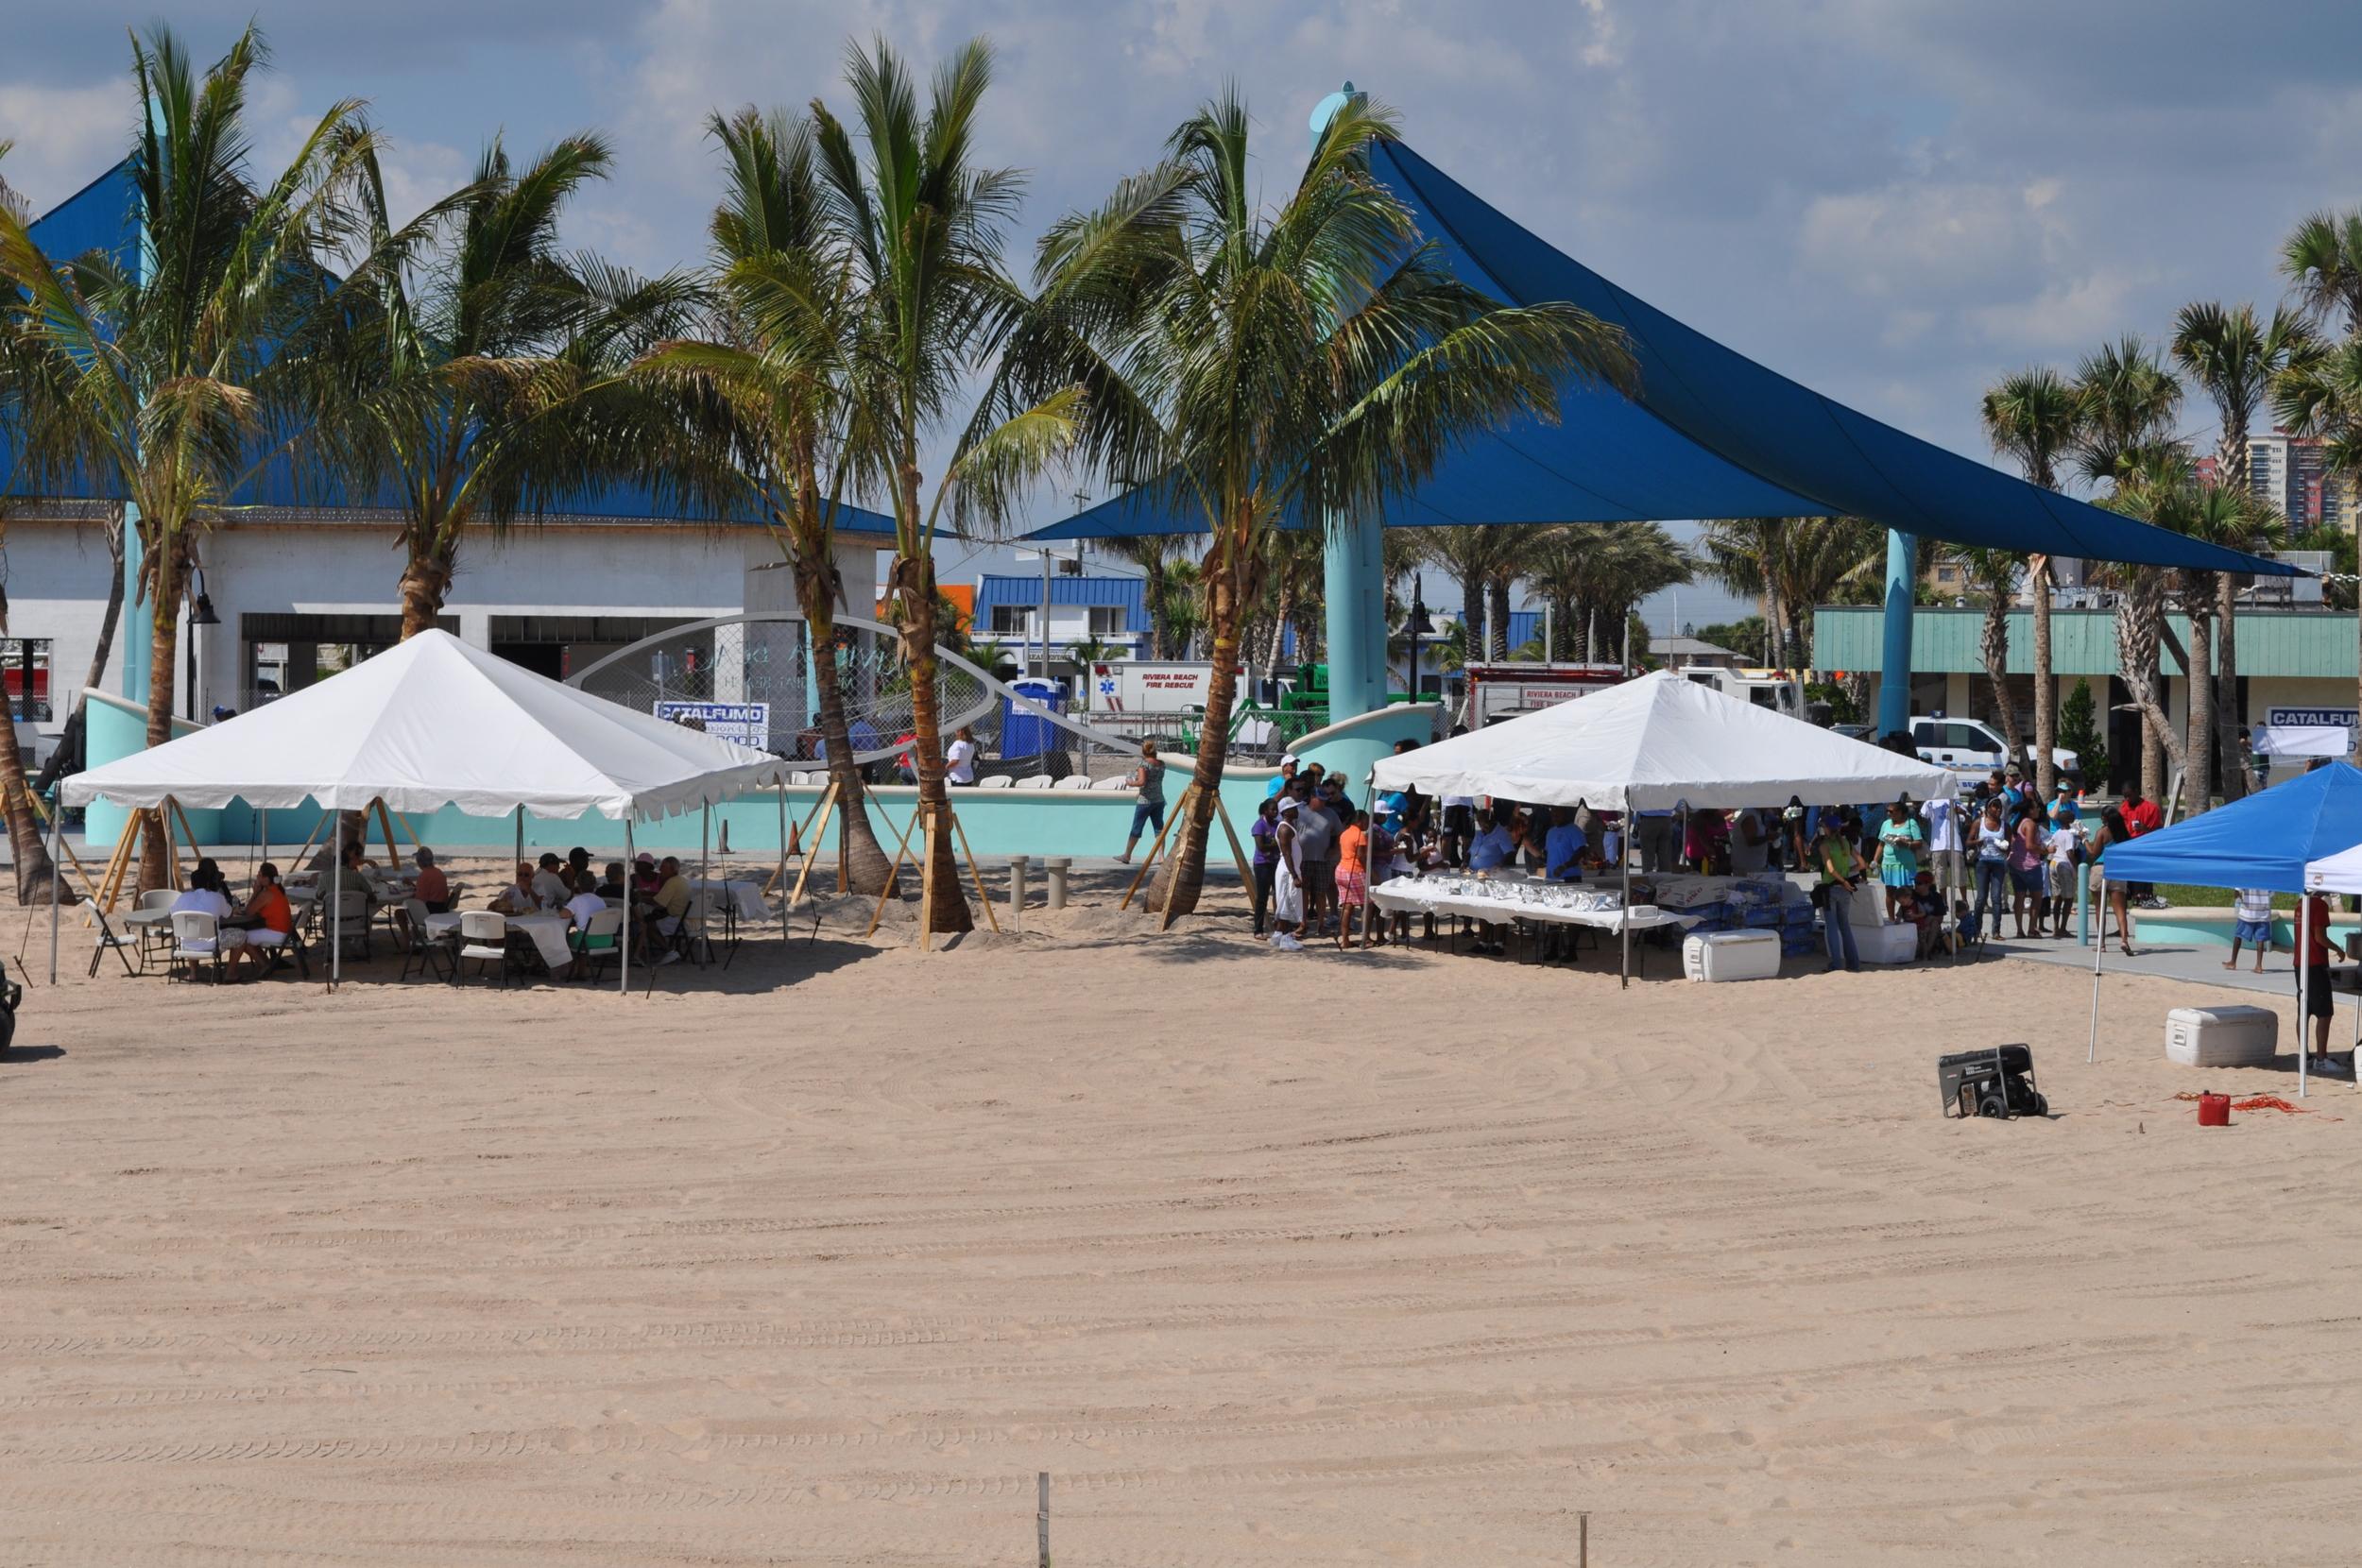 City of Riviera Beach Municipal Beach Park Ocean Mall Shade Sail Events Plaza.jpg